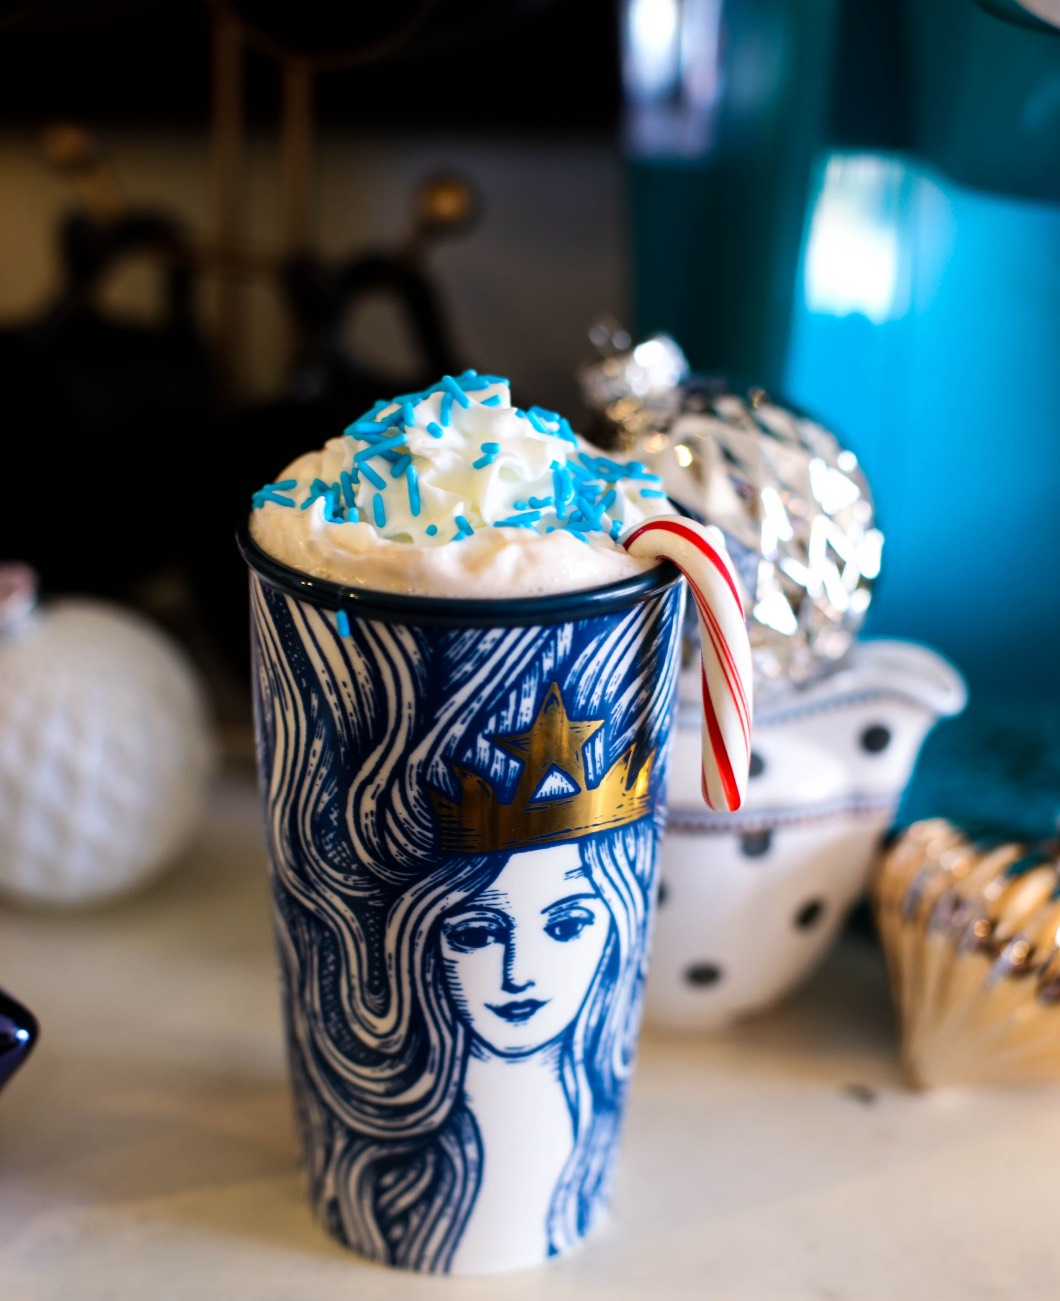 starbucks coffee - Starbucks Christmas Coffee Bar by Atlanta style blogger Happily Hughes